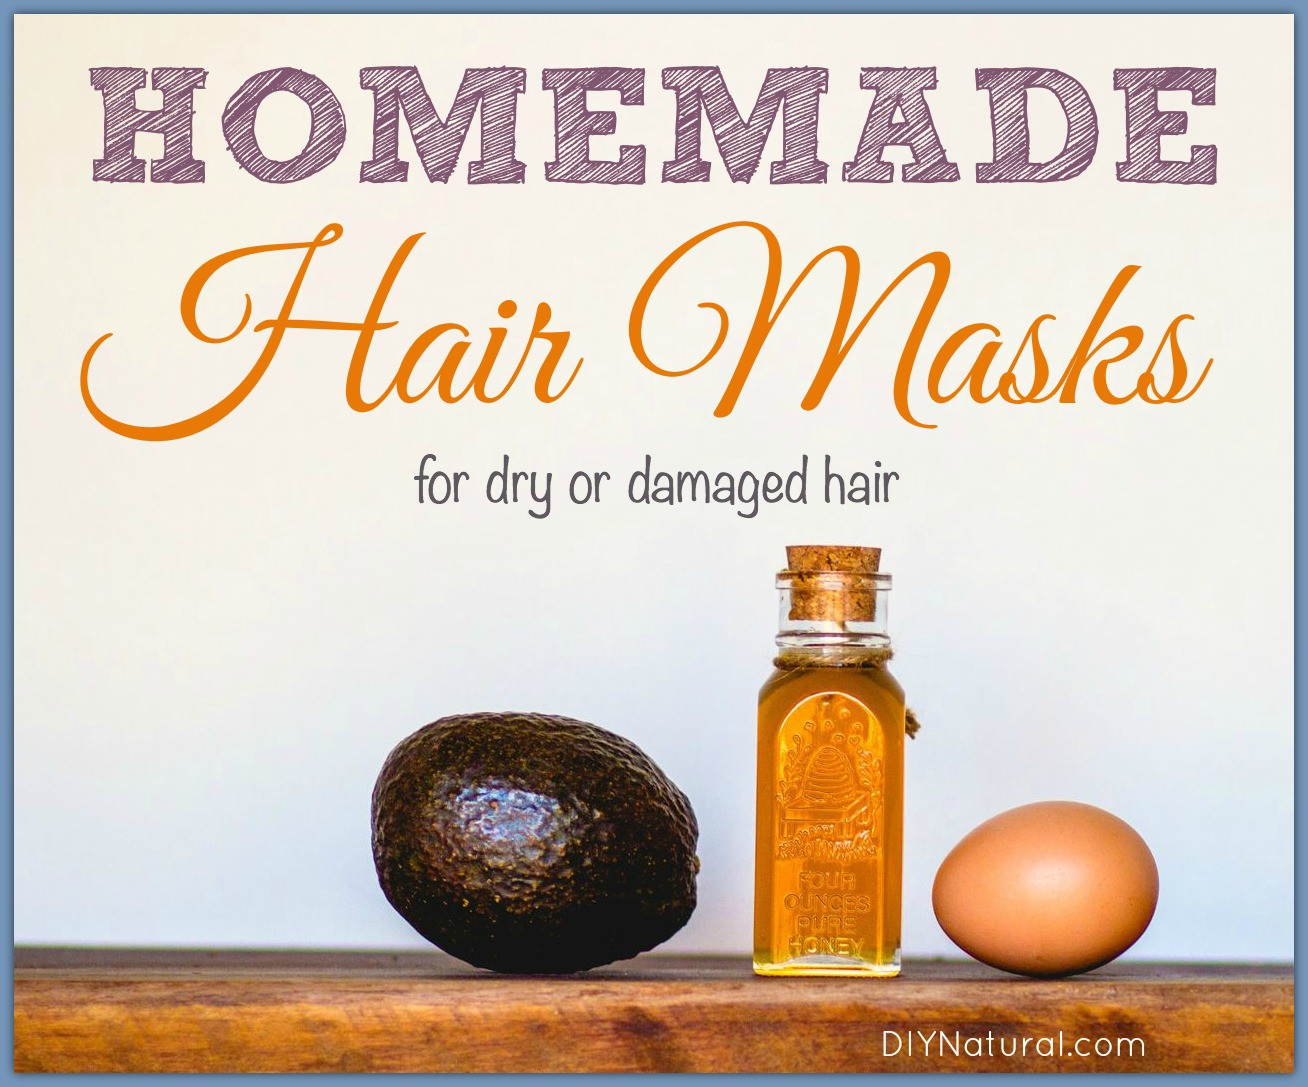 DIY Hair Mask  Homemade Hair Mask Several Recipes for Dry or Damaged Hair